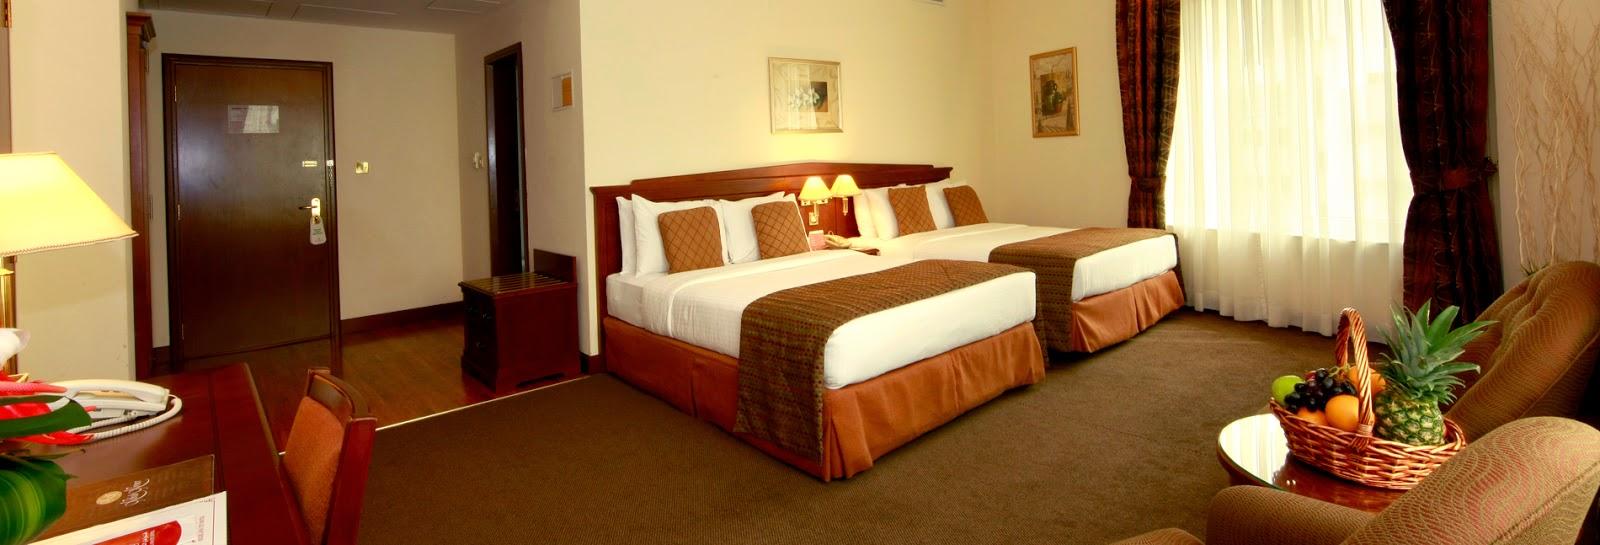 Howard johnson bur dubai 3 star hotels in dubai april 2015 for Star boutique hotel dubai